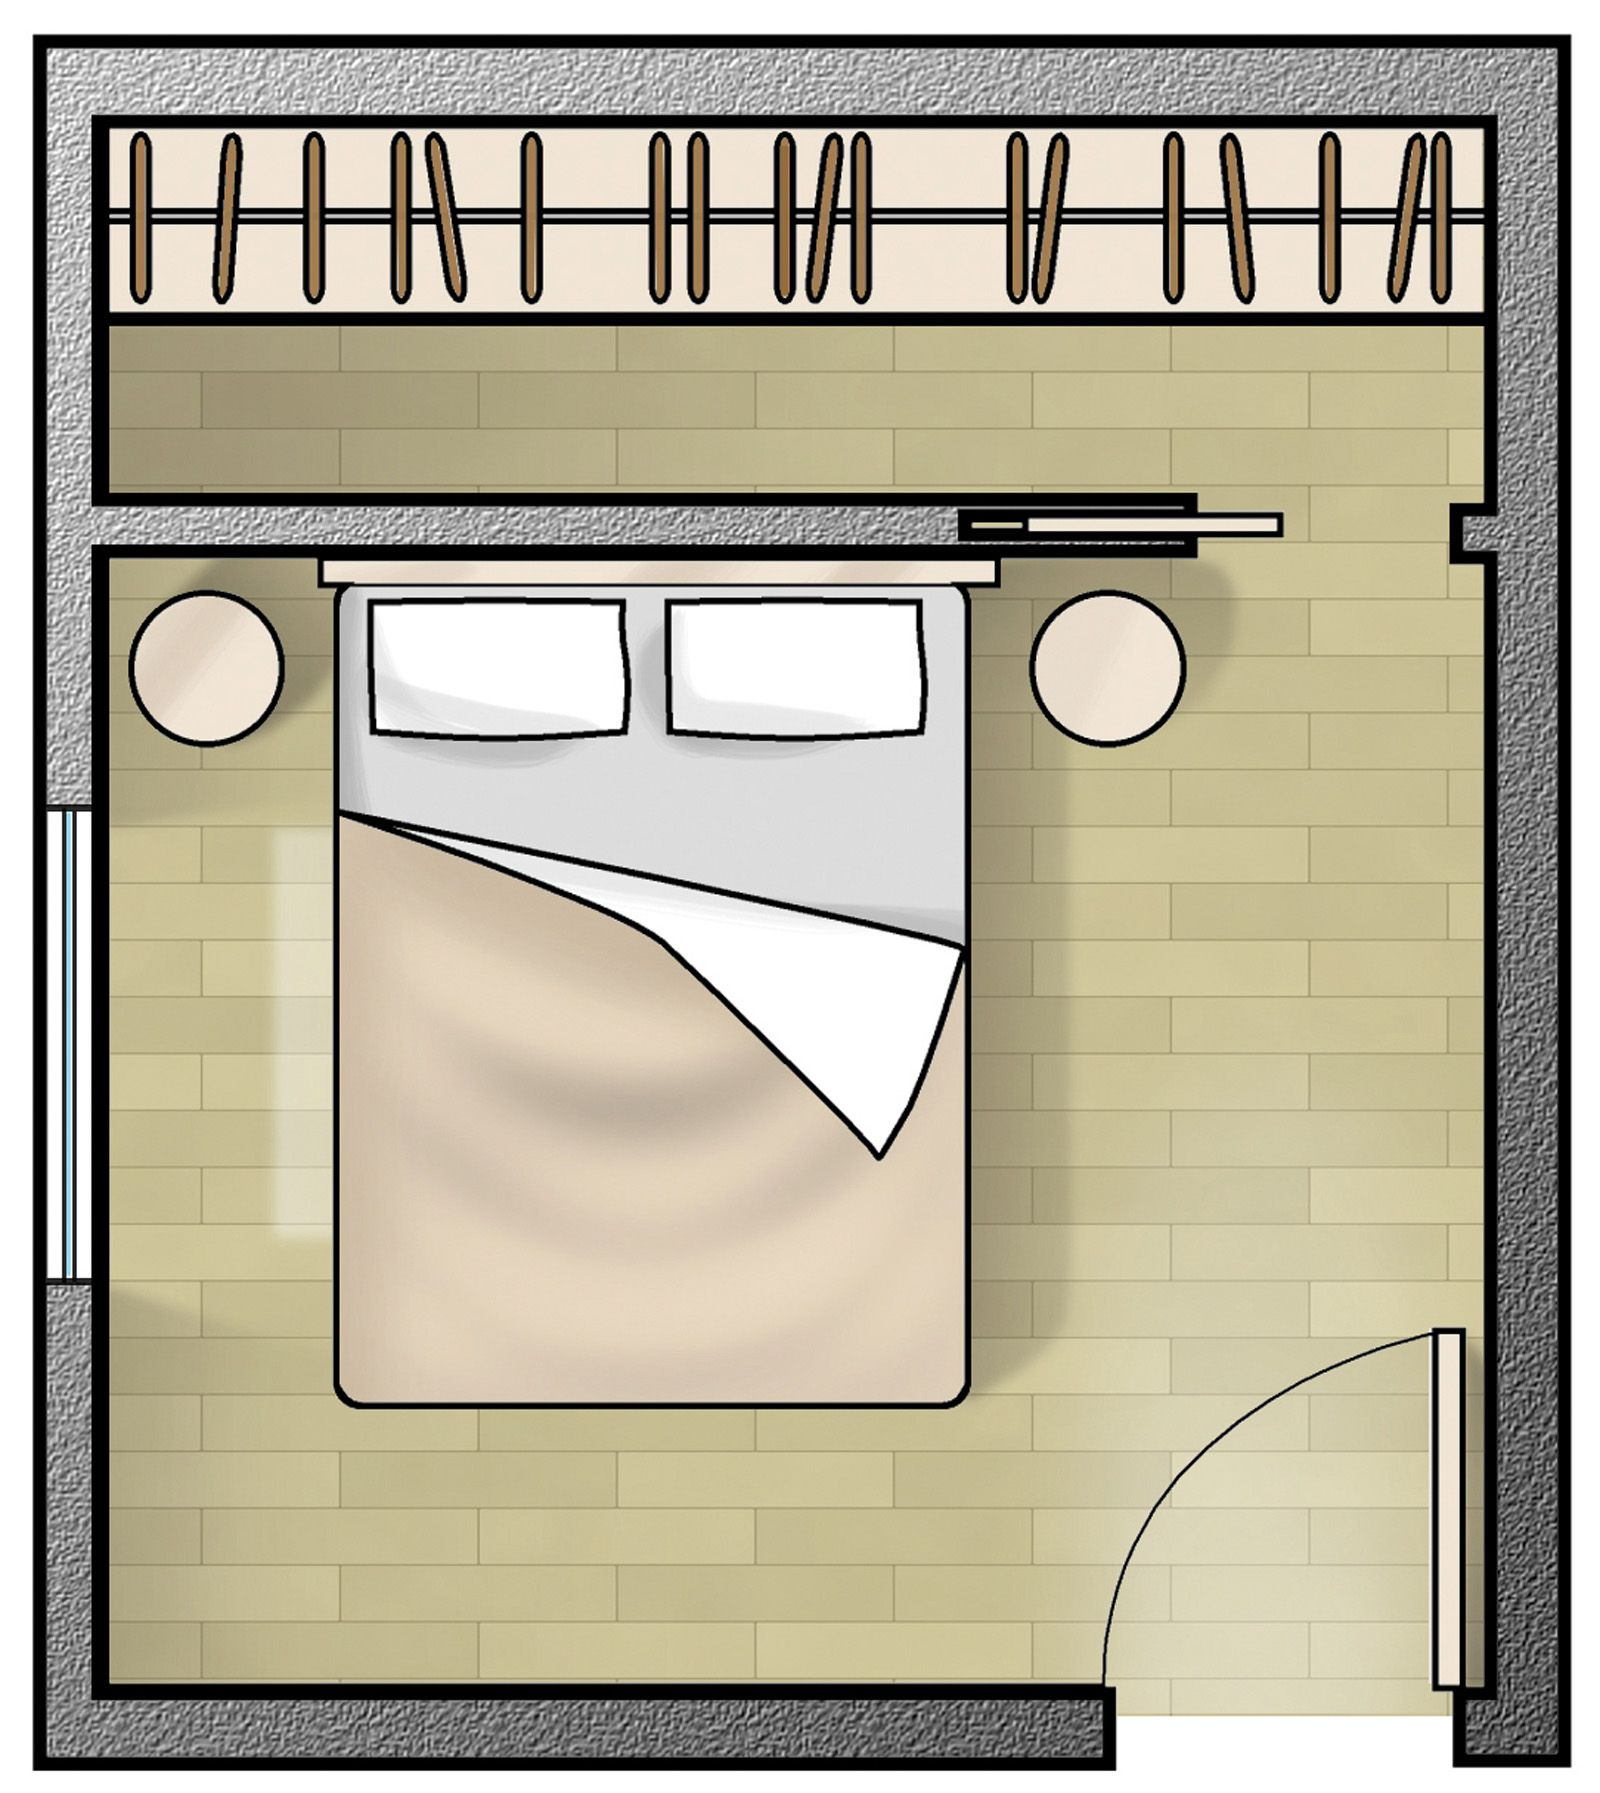 Spazio Minimo Cabina Armadio.Cabina Armadio Camera Piccola Cosedicasa Arredamento D